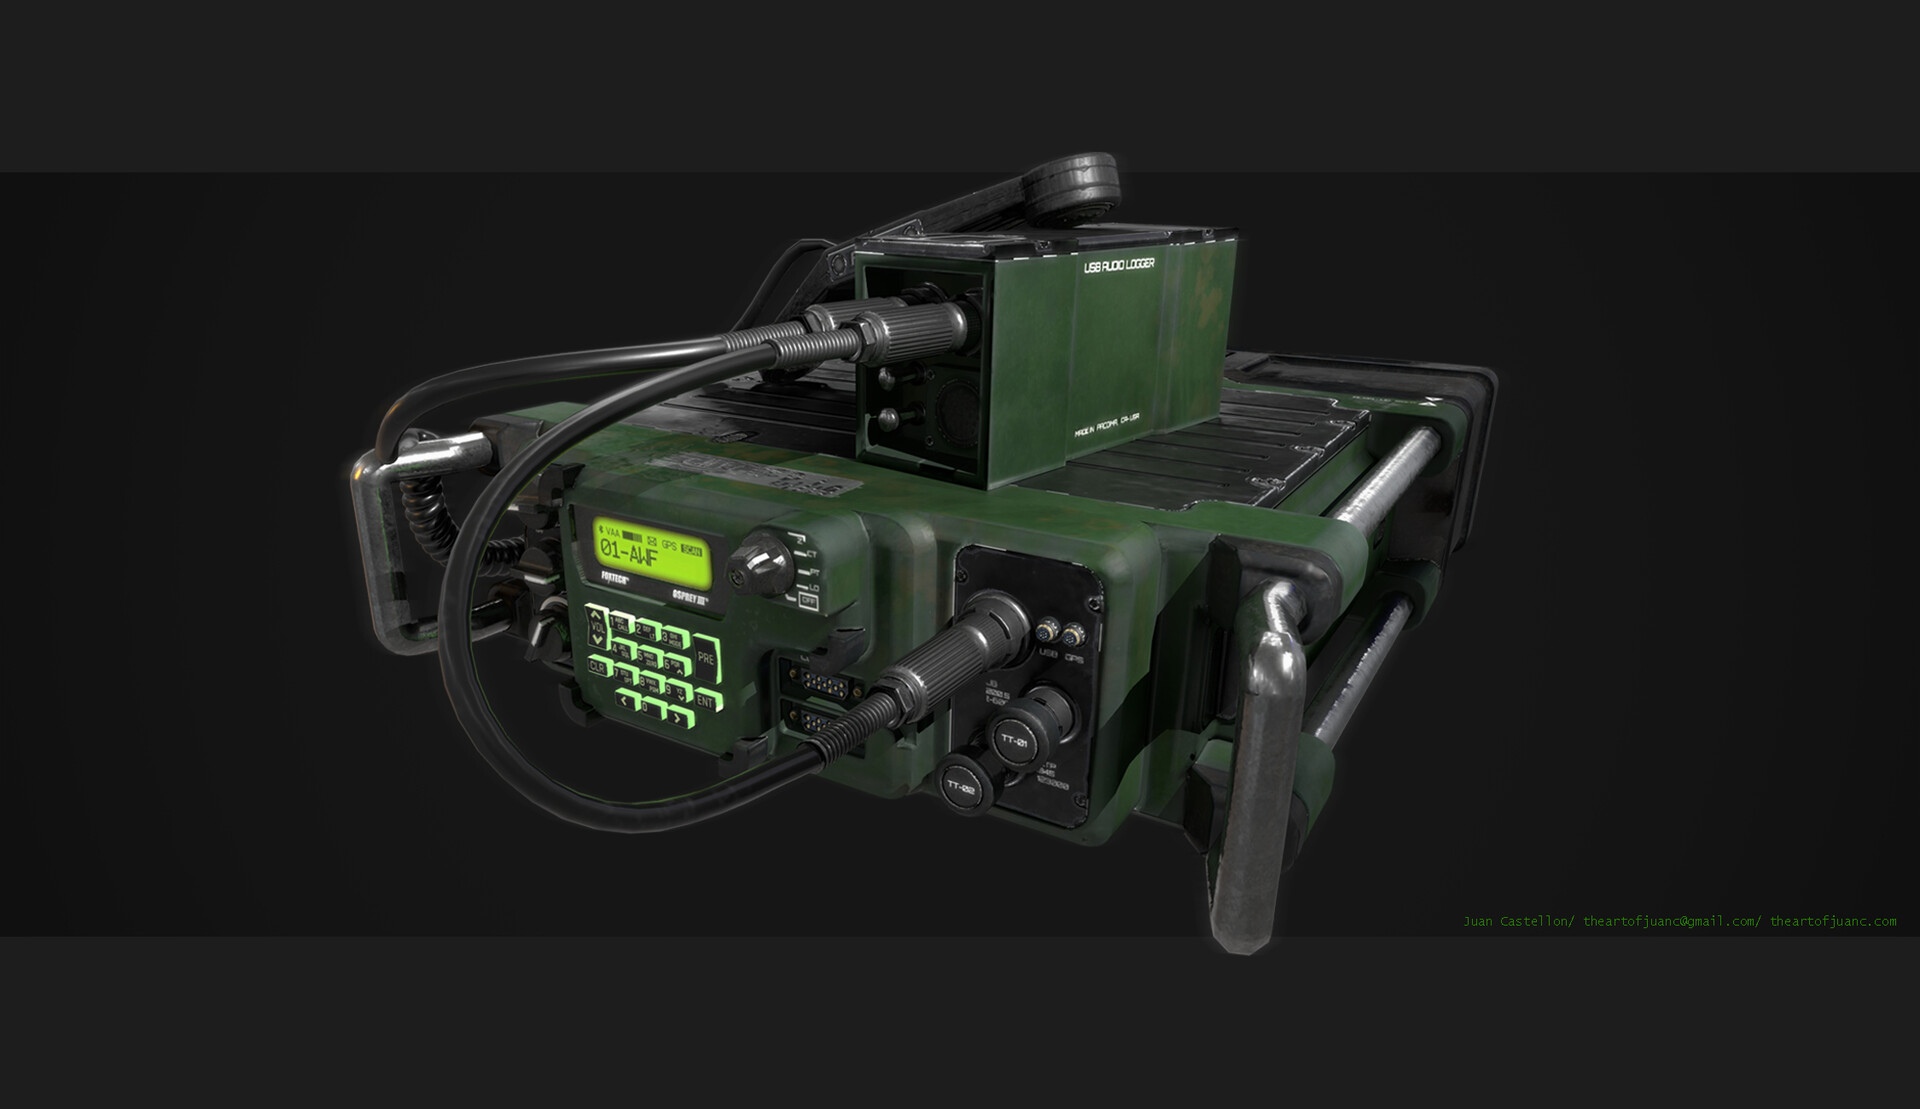 Juan Castellon - Military Radio